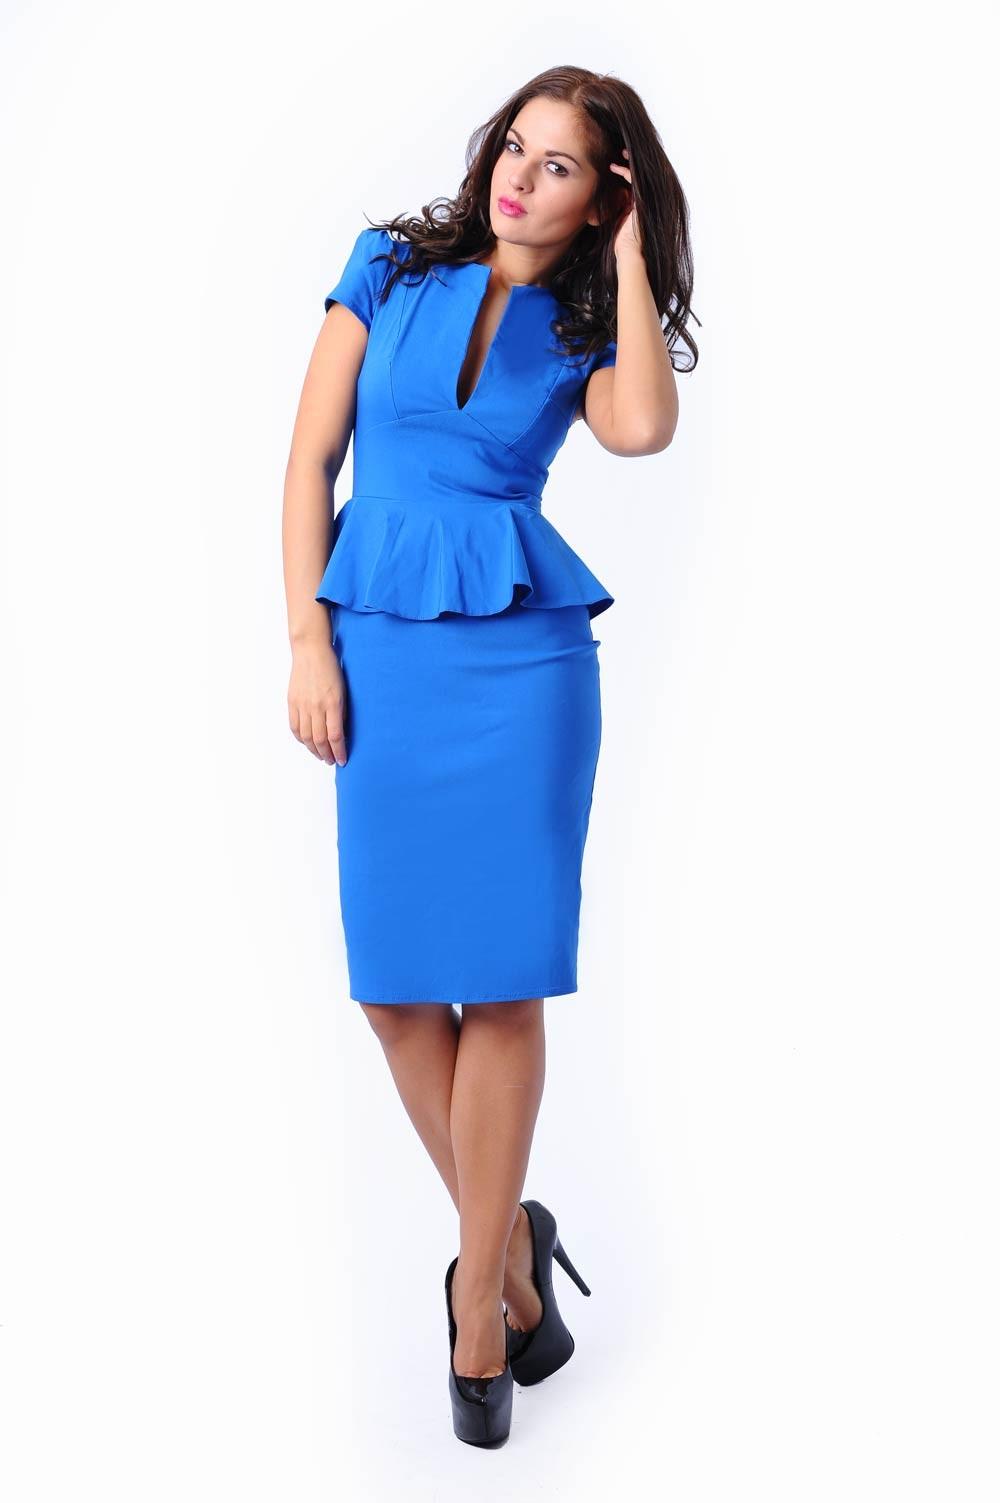 Blue peplum dress - Fashion dresses